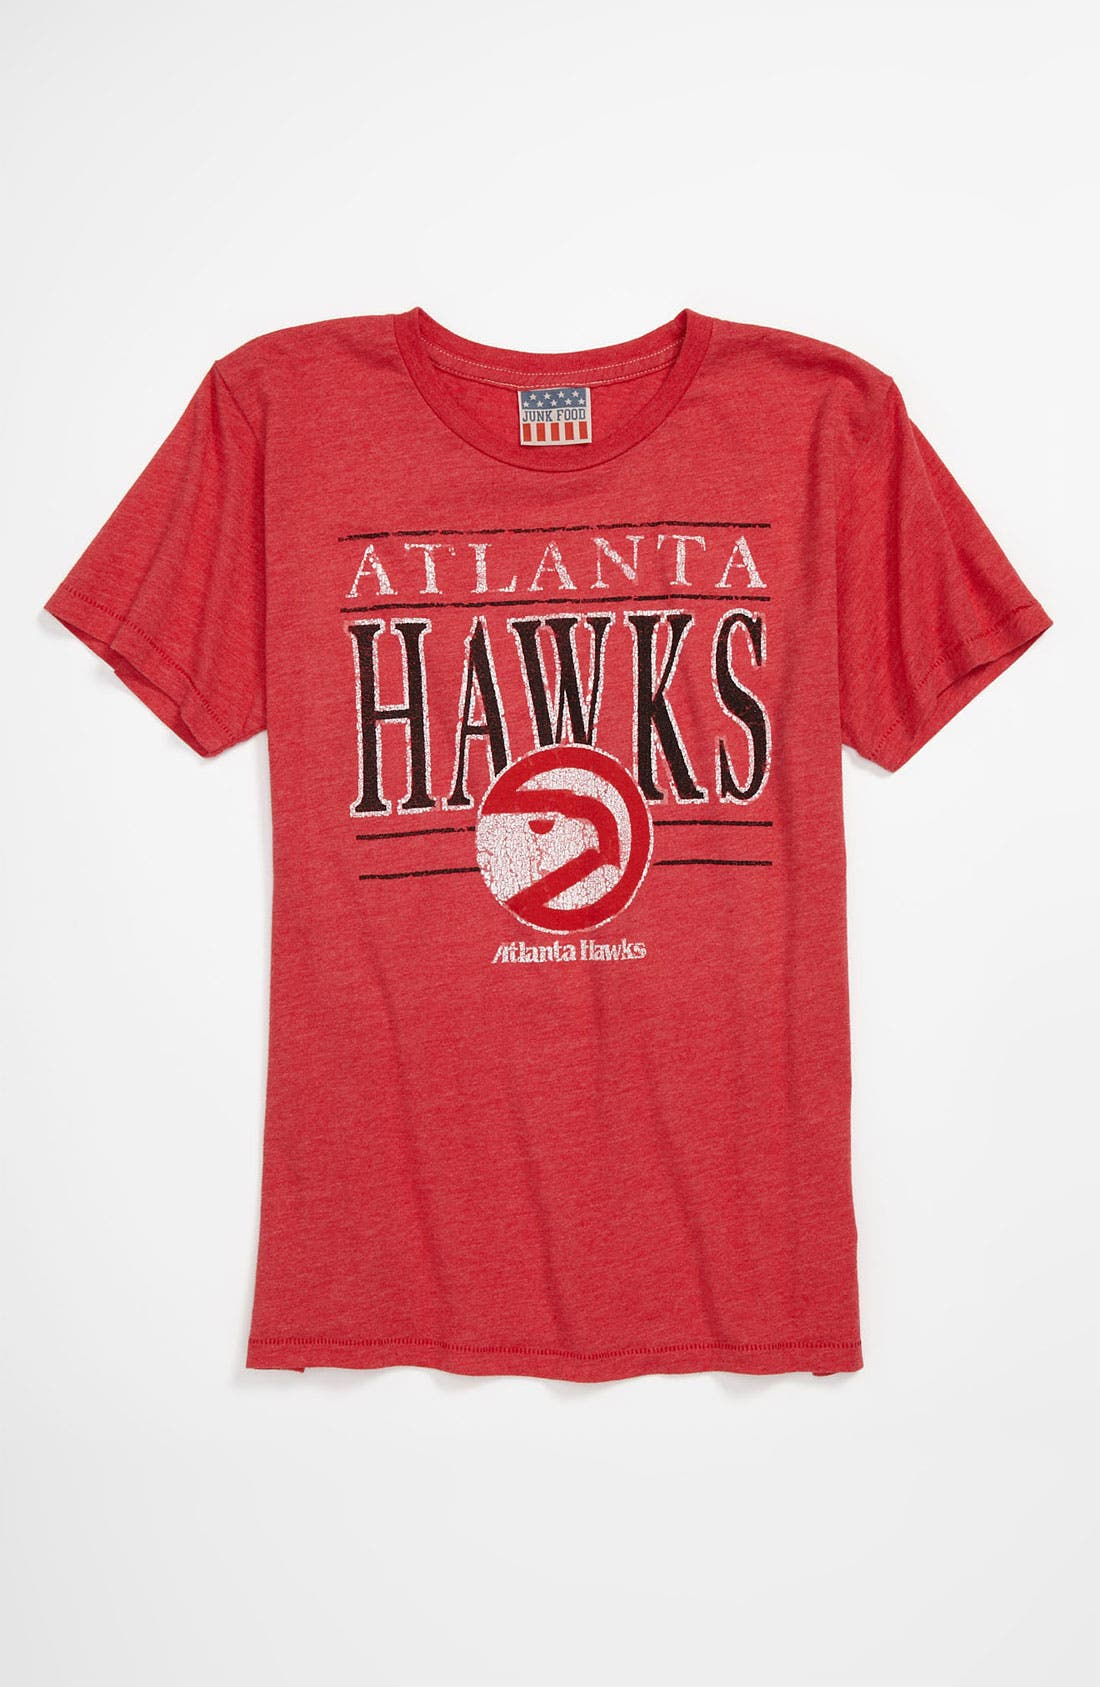 Alternate Image 1 Selected - Junk Food 'Atlanta Hawks' T-Shirt (Little Boys & Big Boys)